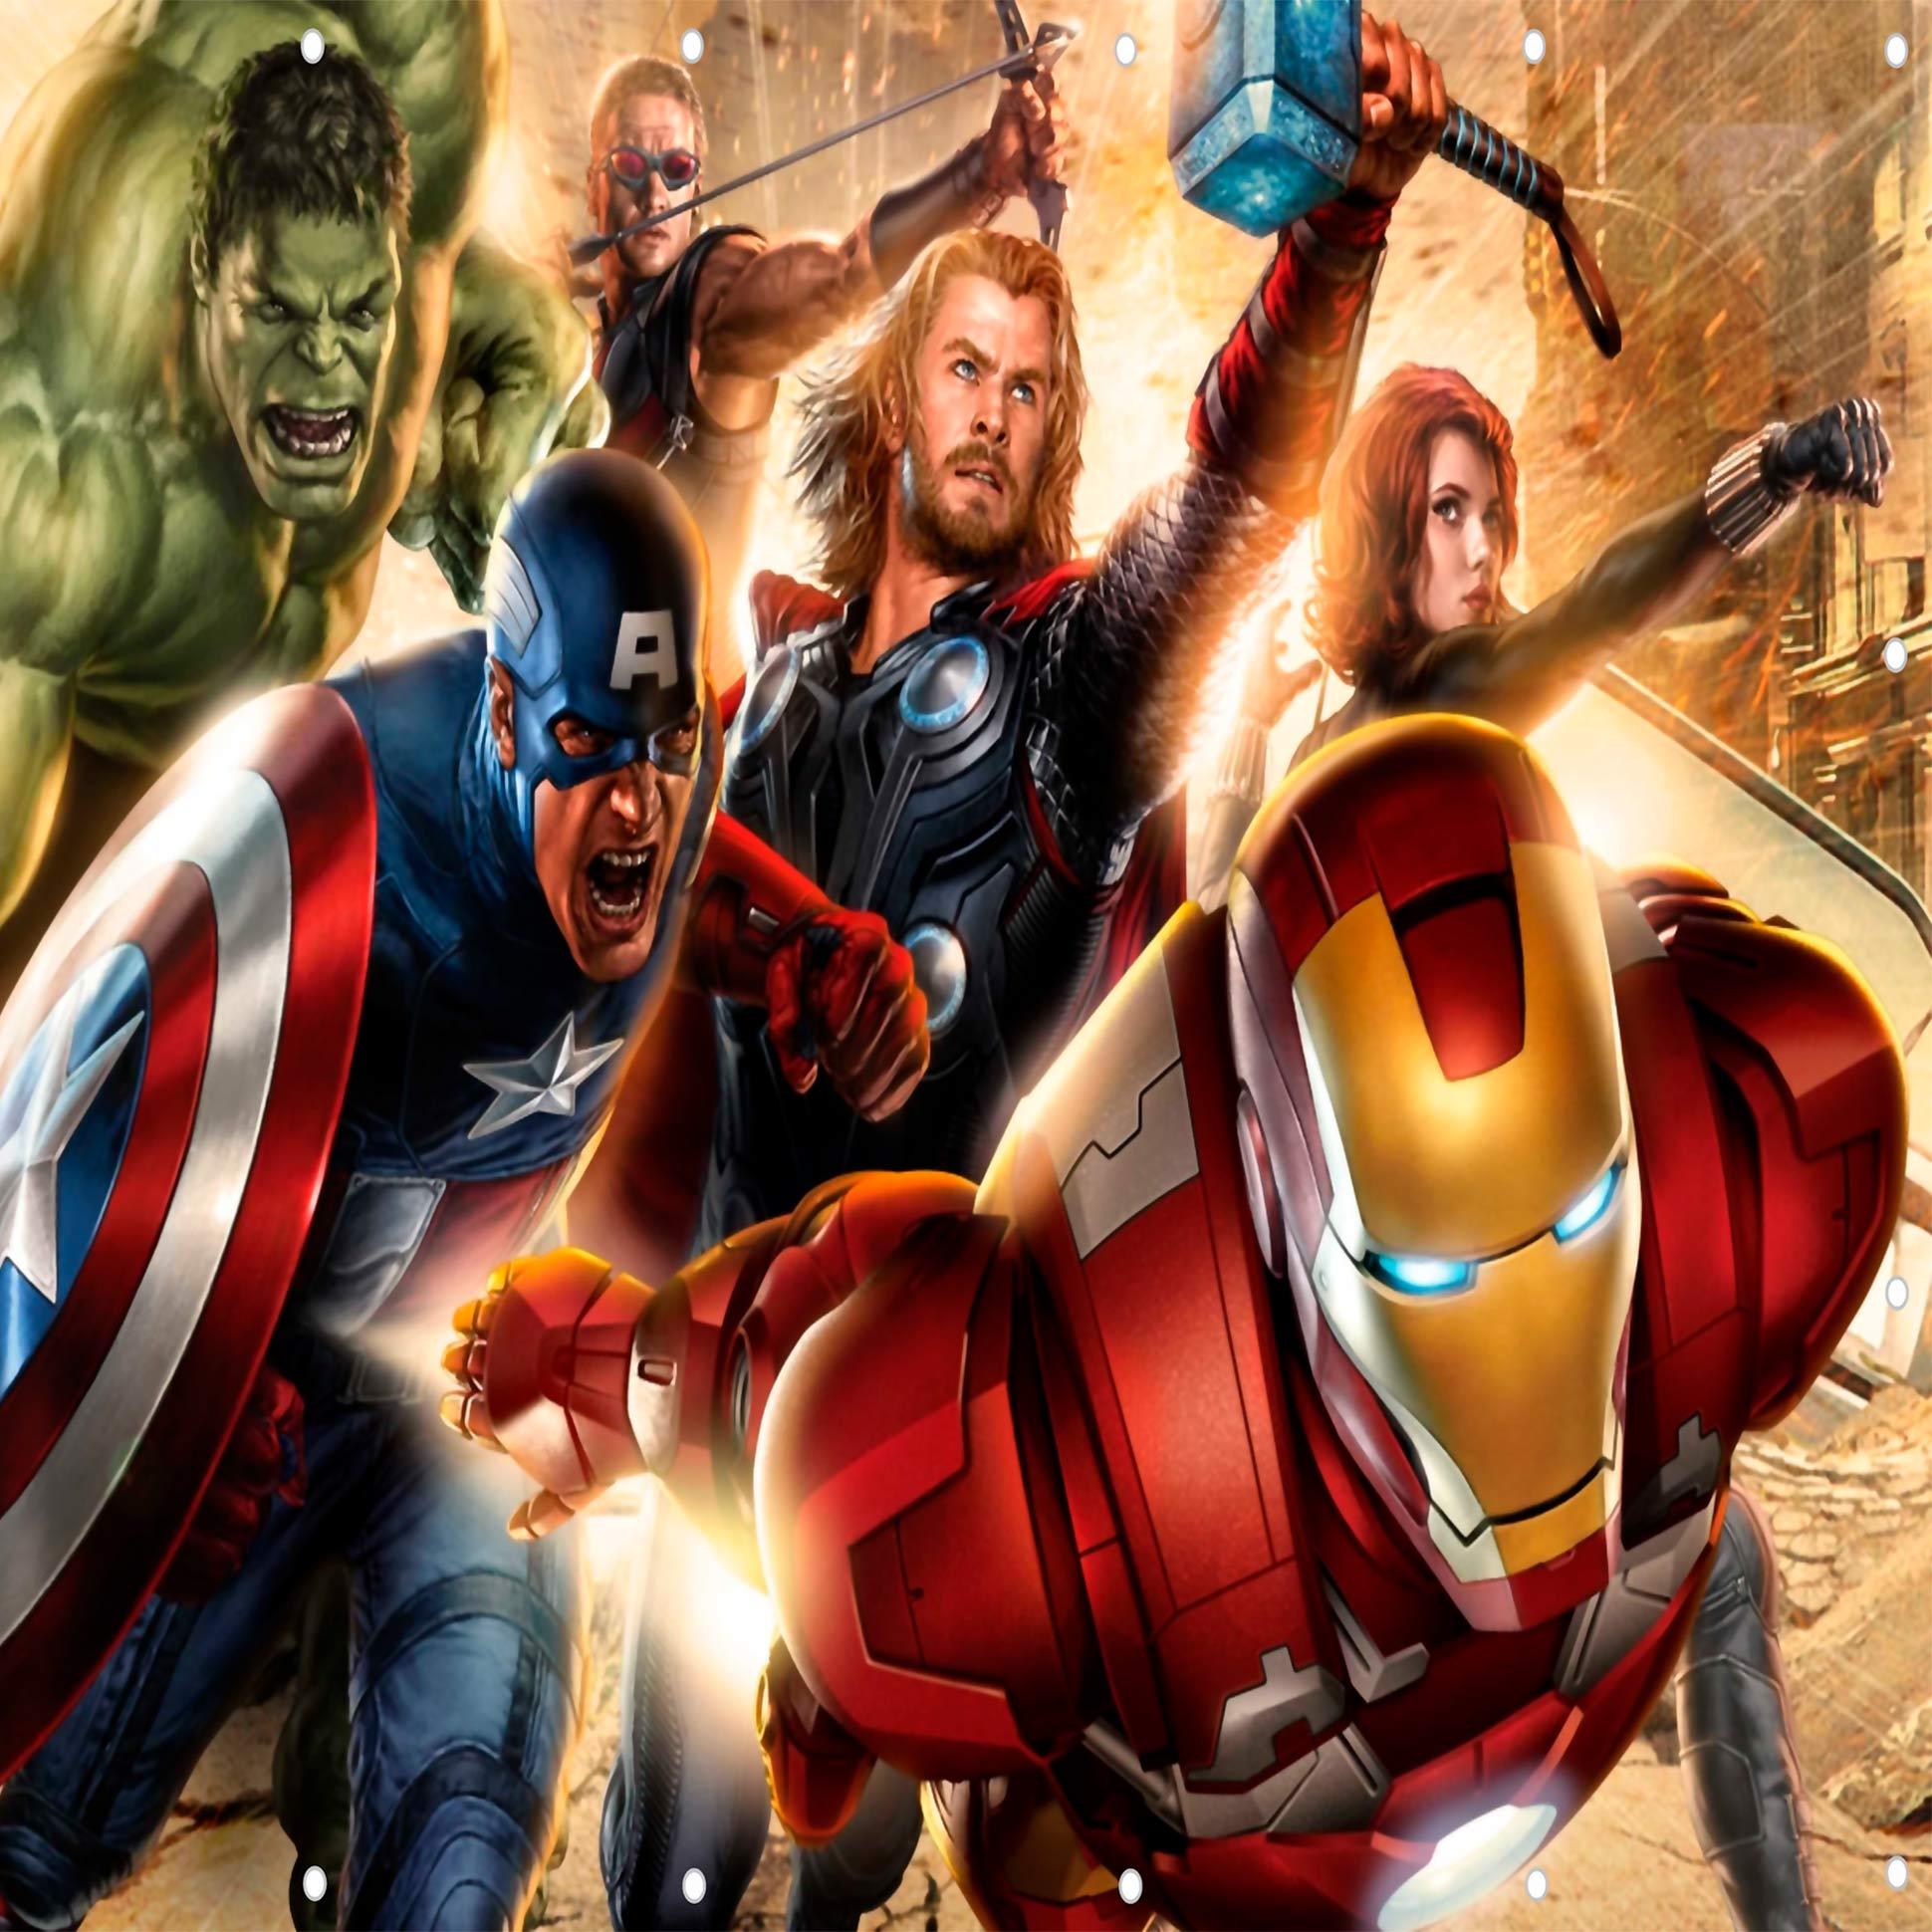 Papel De Parede Adesivo Vingadores Marvel Amarelado  - Final Decor